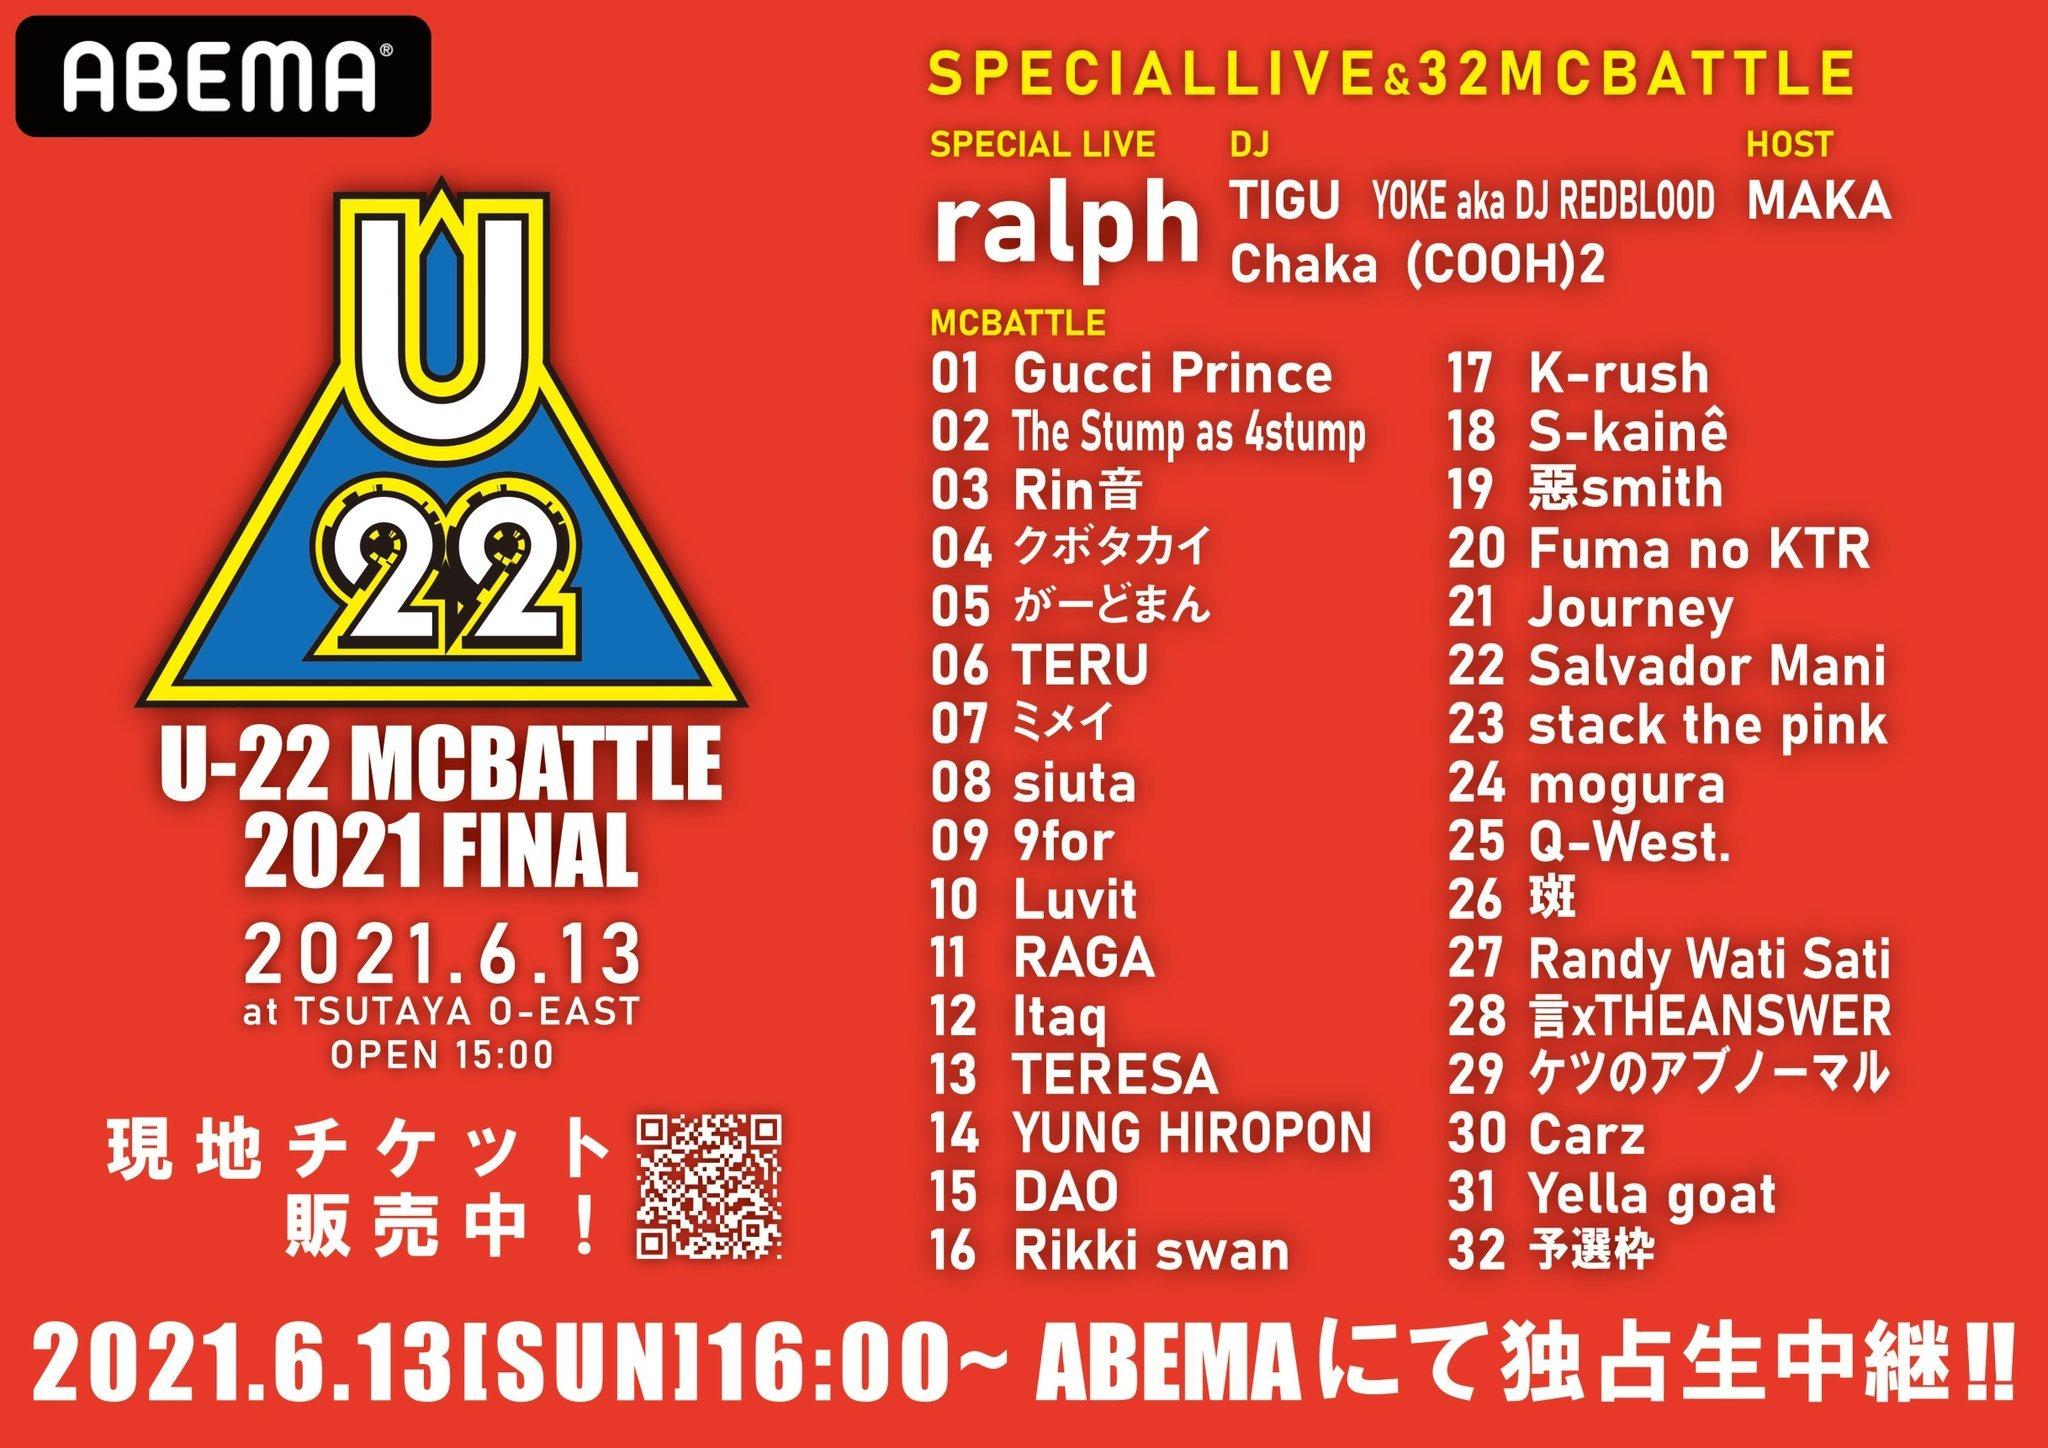 6/13 U-22 MCBATTLE 2021 FINAL abemaで無料配信_e0246863_19251685.jpg